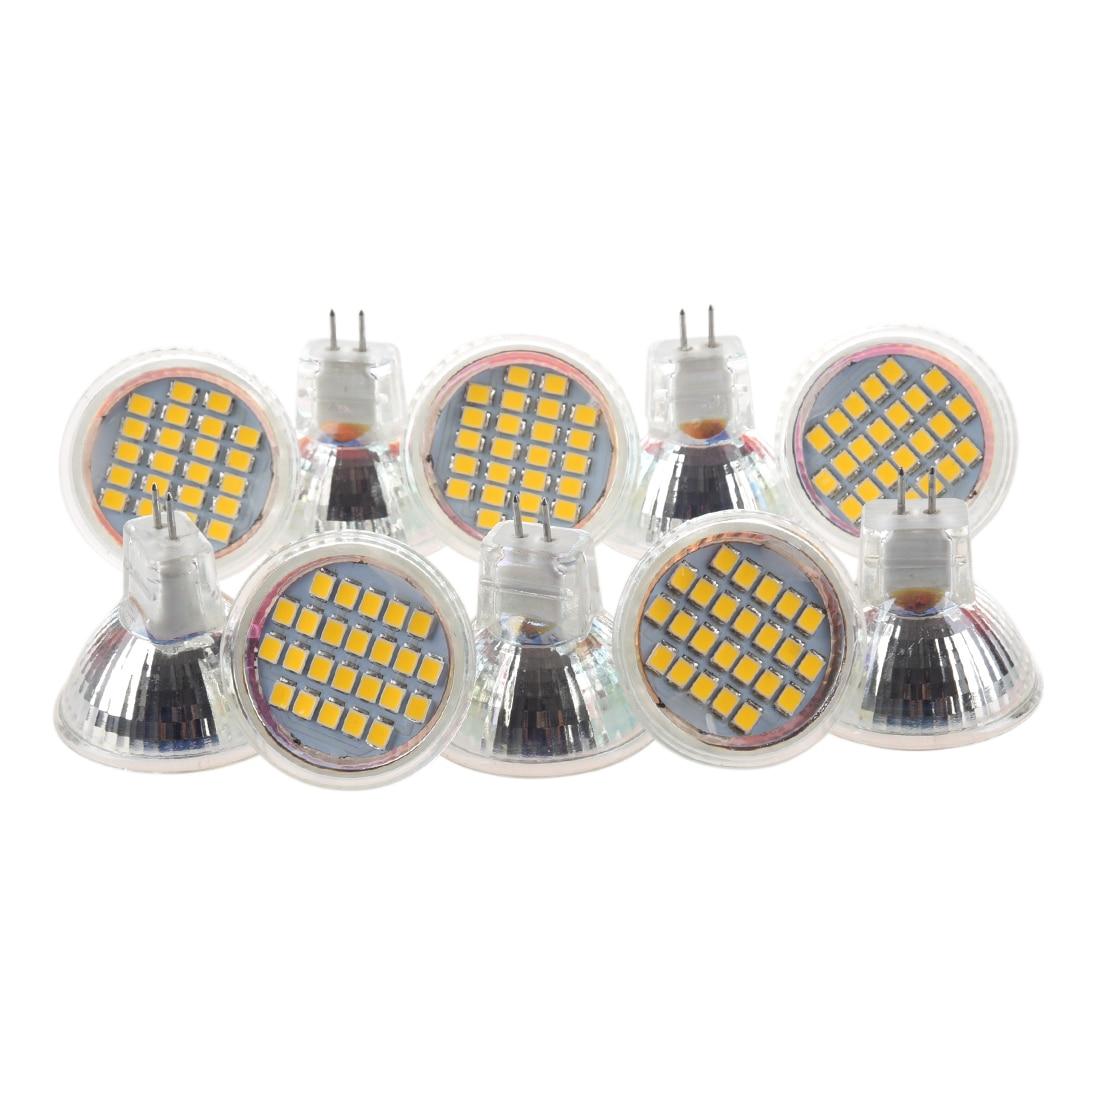 все цены на CSS 10pcs MR11 GU4 Warm White 3528 SMD 24 LED Home Spotlight Light Lamp Bulb 1W 12V онлайн